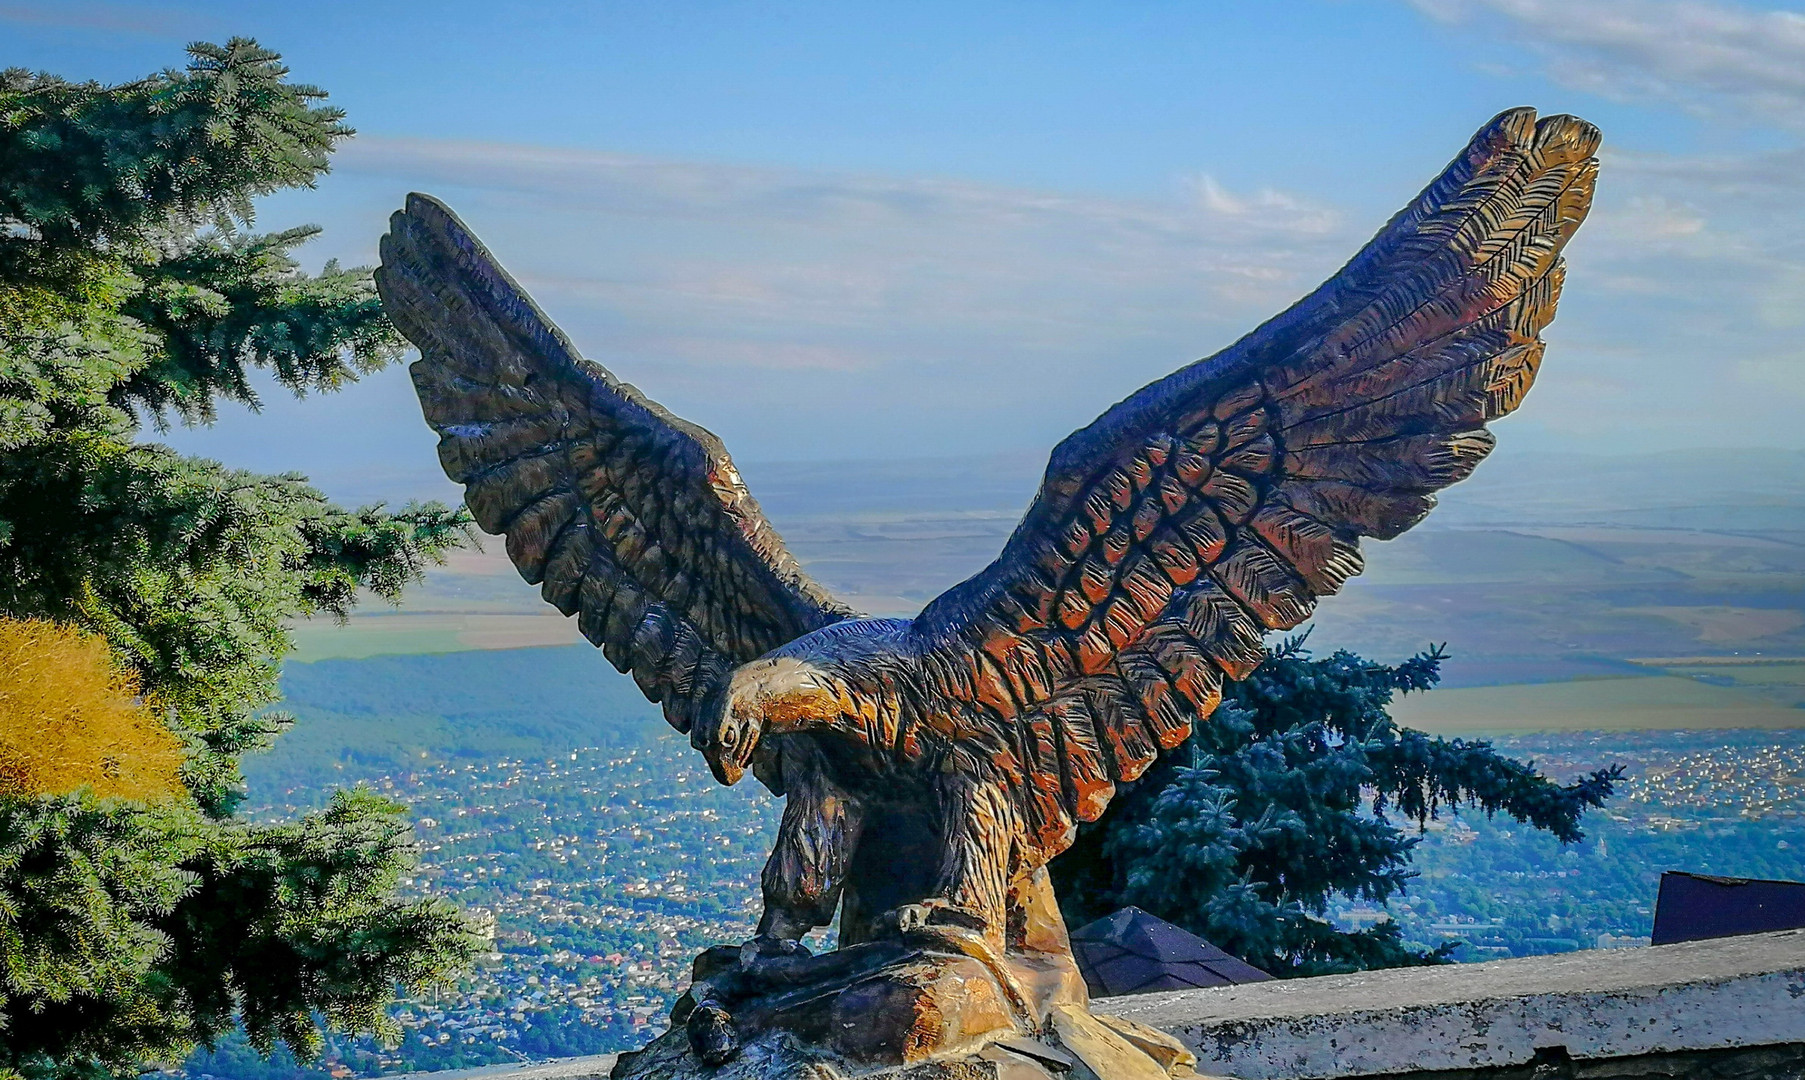 Символ Кавказа на горе Машук, Пятигорск